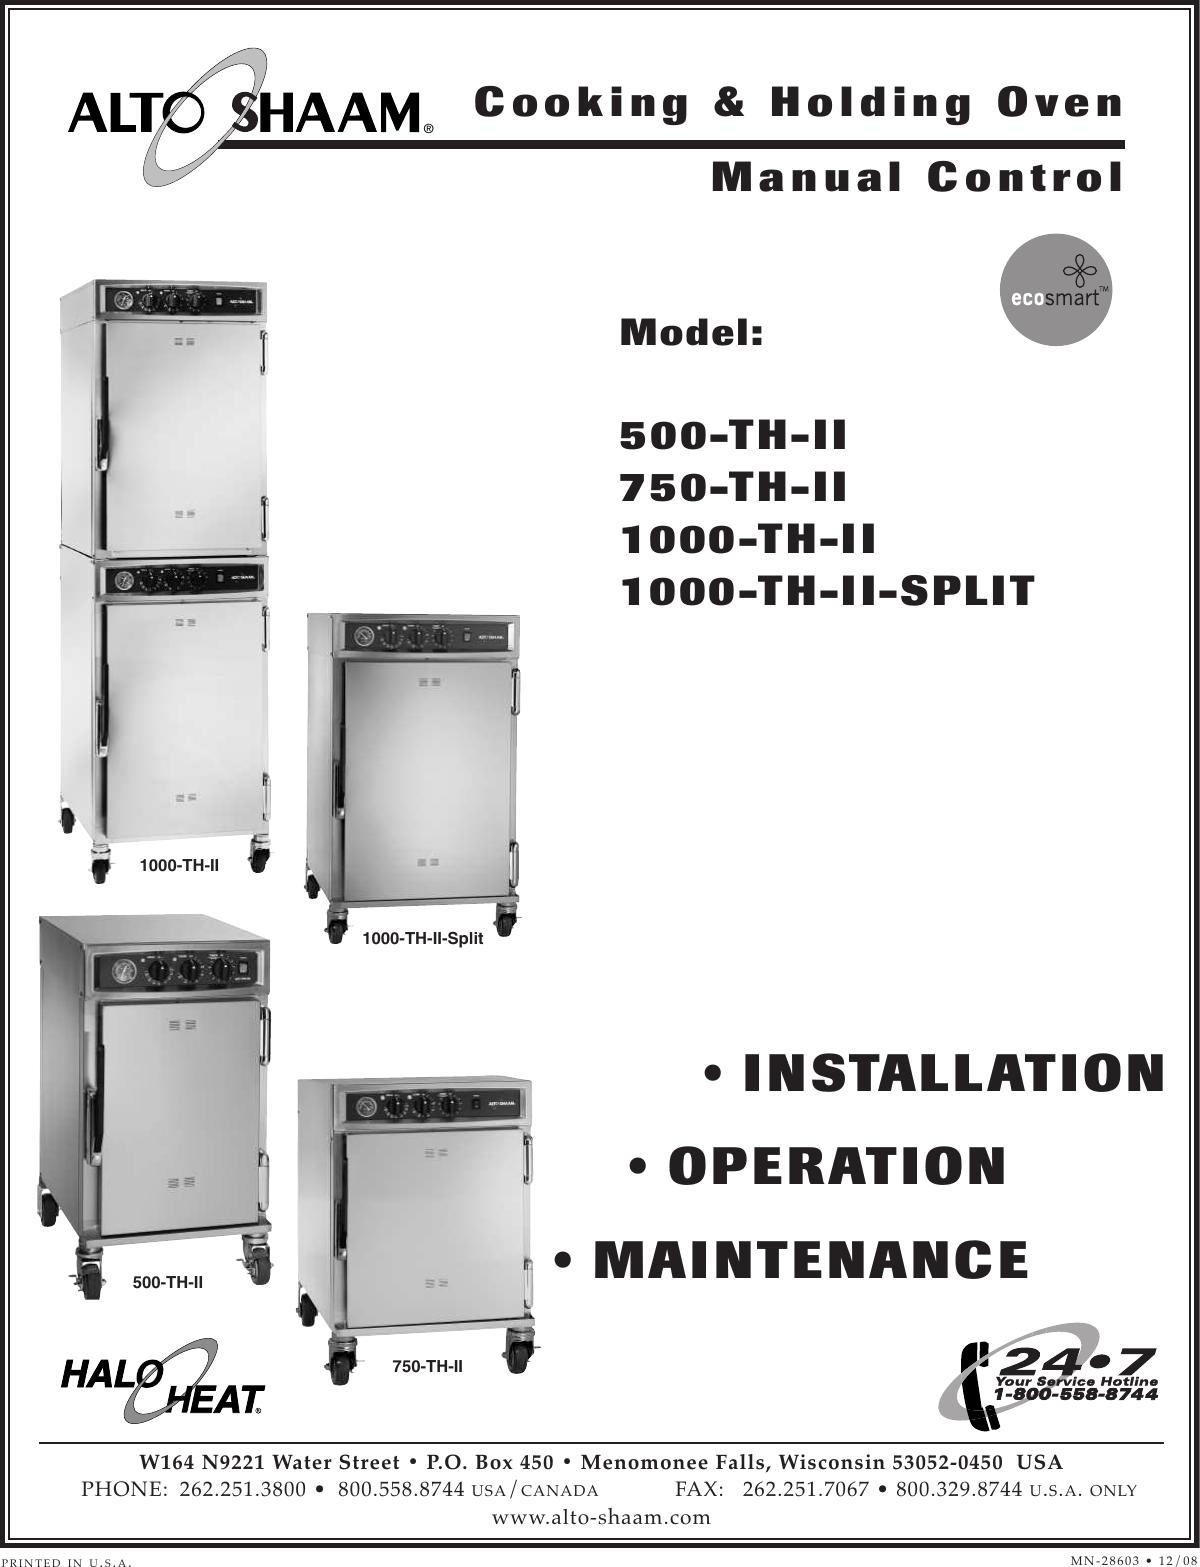 [WQZT_9871]  Alto Shaam 1000 Th Ii Split Users Manual 833_750 THII_U | Alto Shaam Wiring Diagram |  | UserManual.wiki